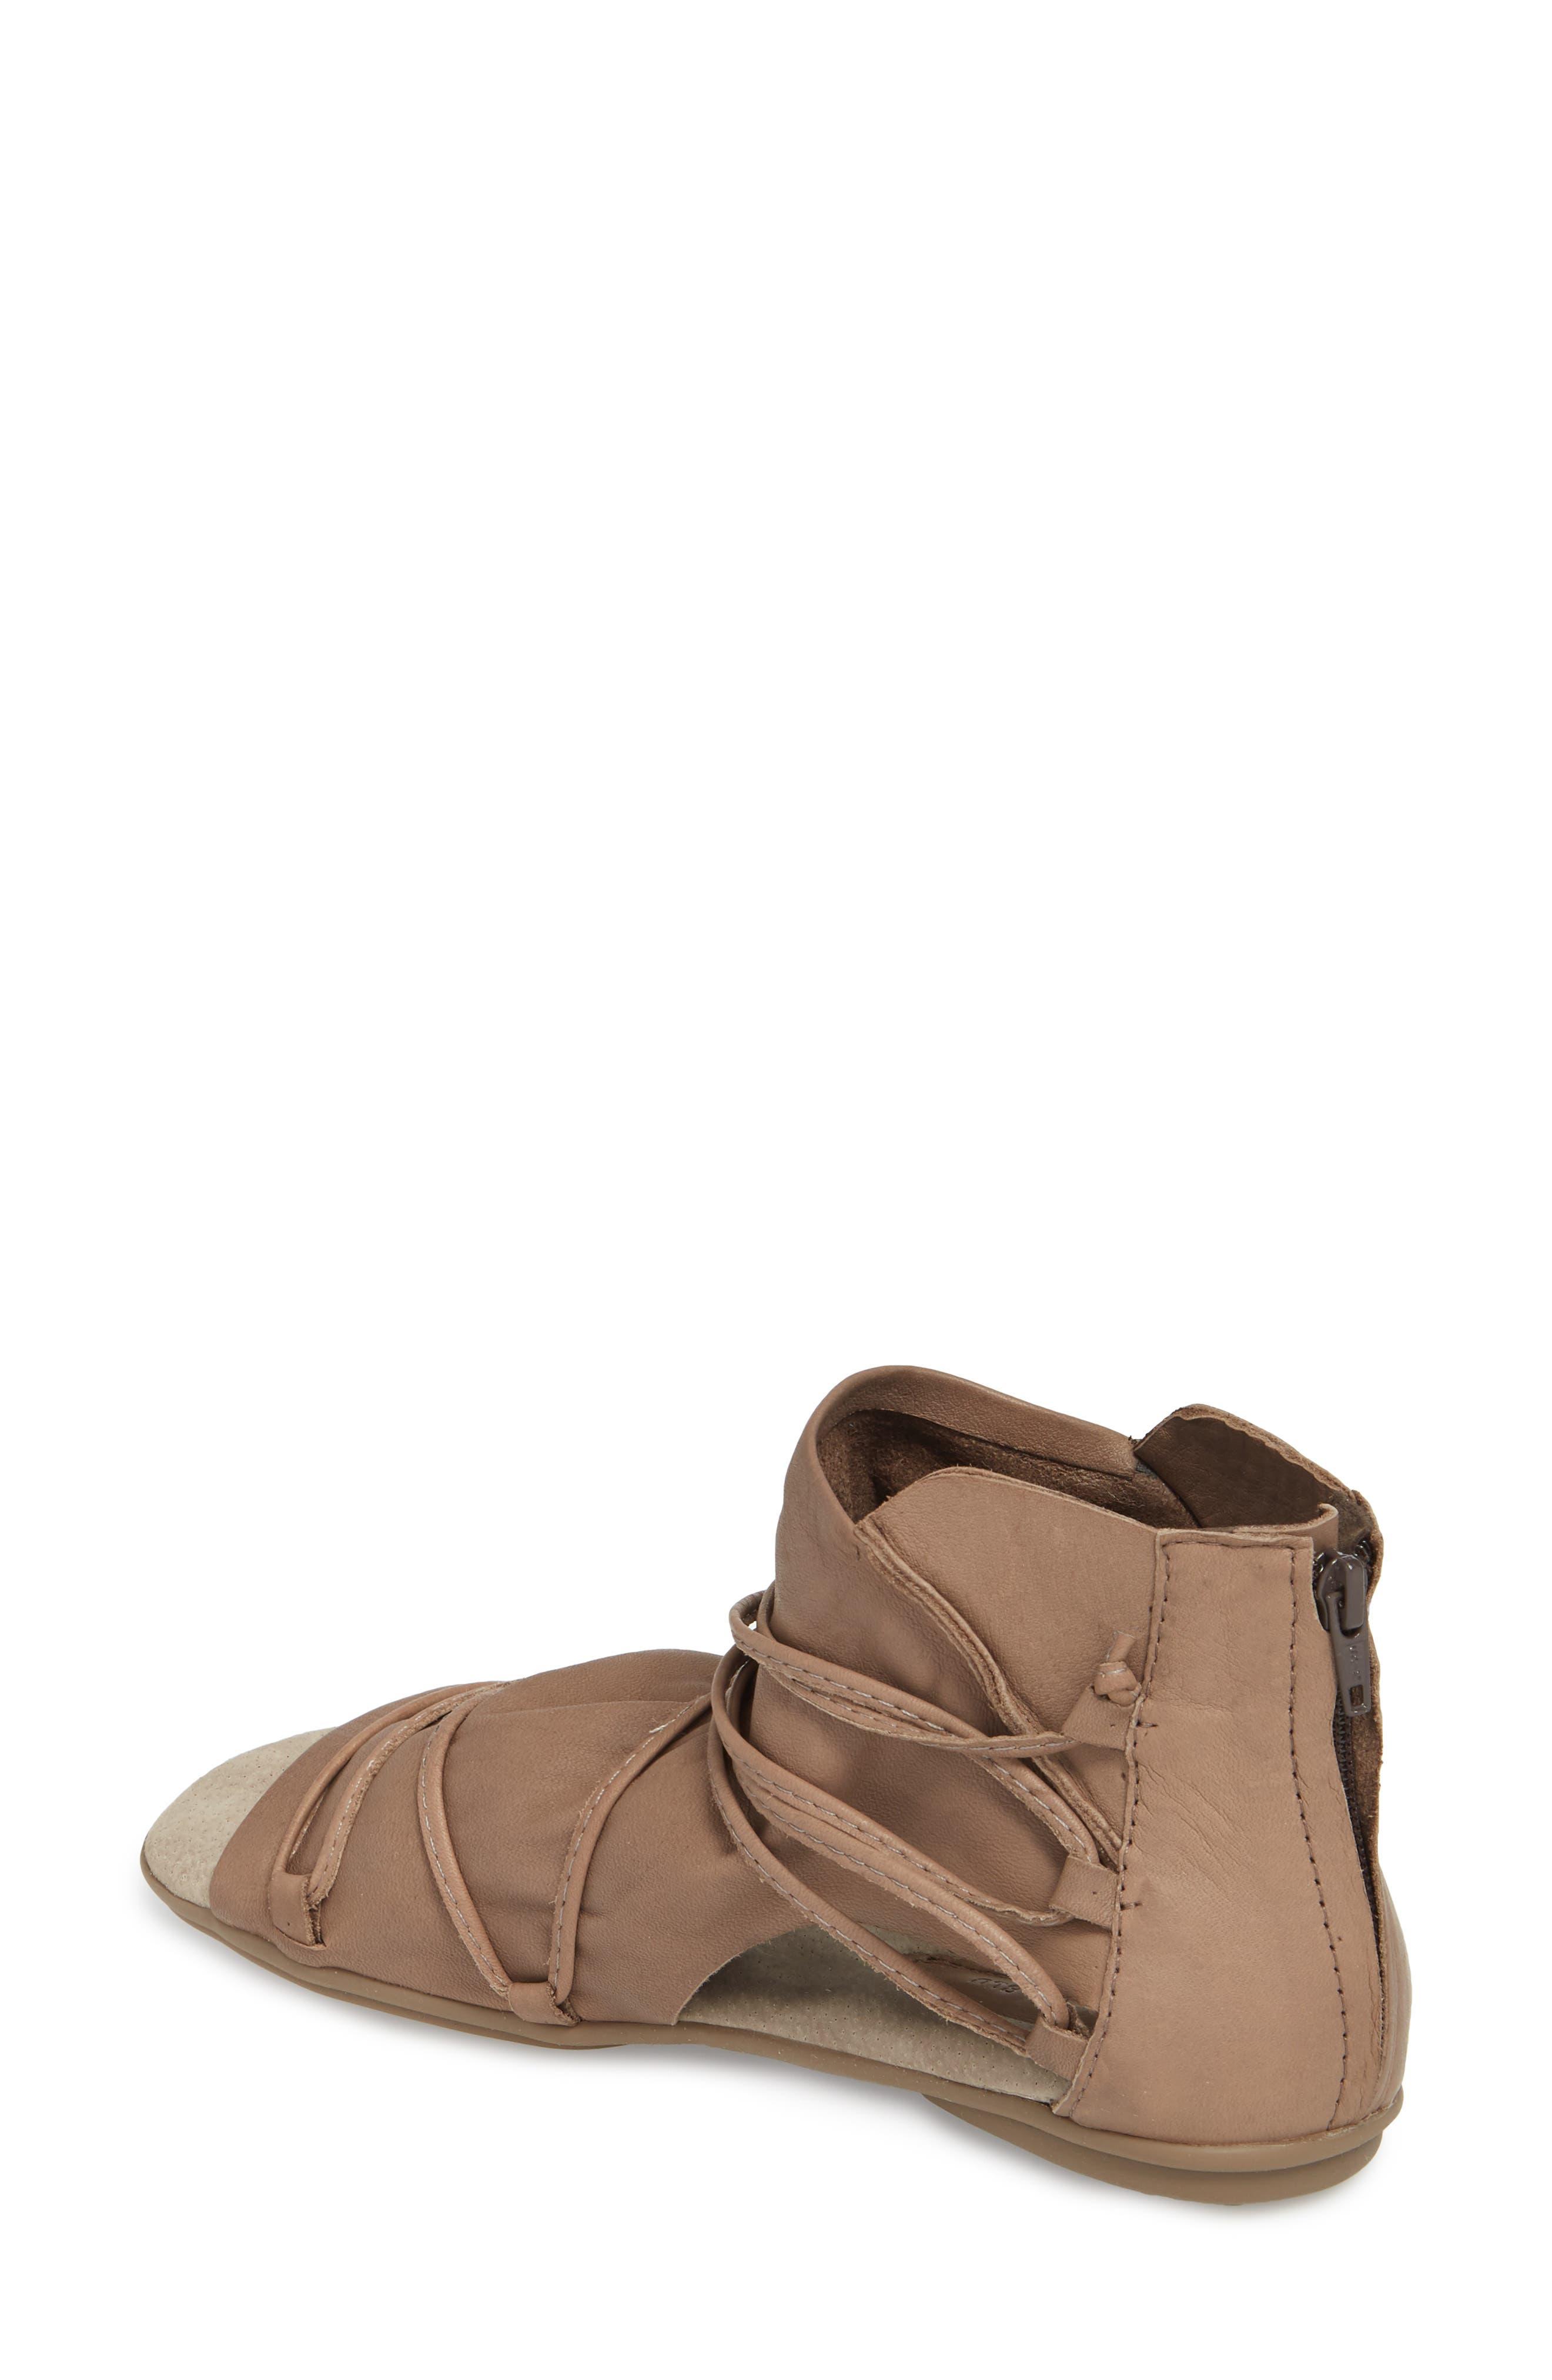 Byron Flat,                             Alternate thumbnail 2, color,                             Khaki Leather